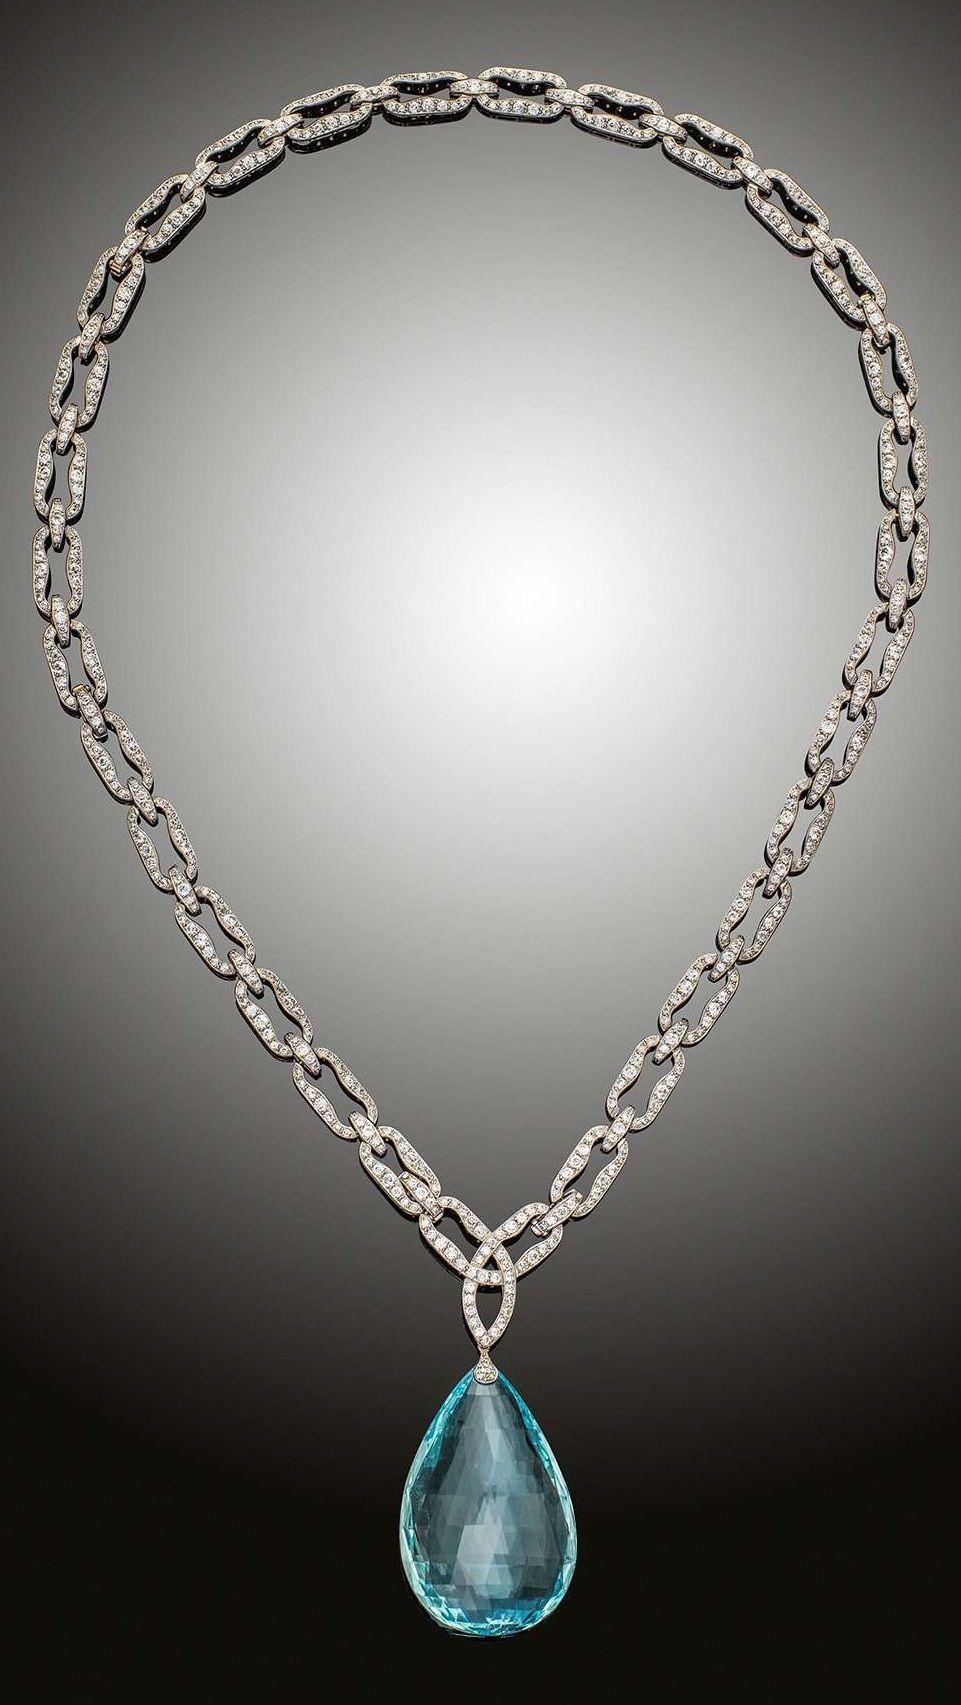 An edwardian aquamarine and diamond pendant necklace english an edwardian aquamarine and diamond pendant necklace english circa 1910 a large aquamarine aloadofball Gallery